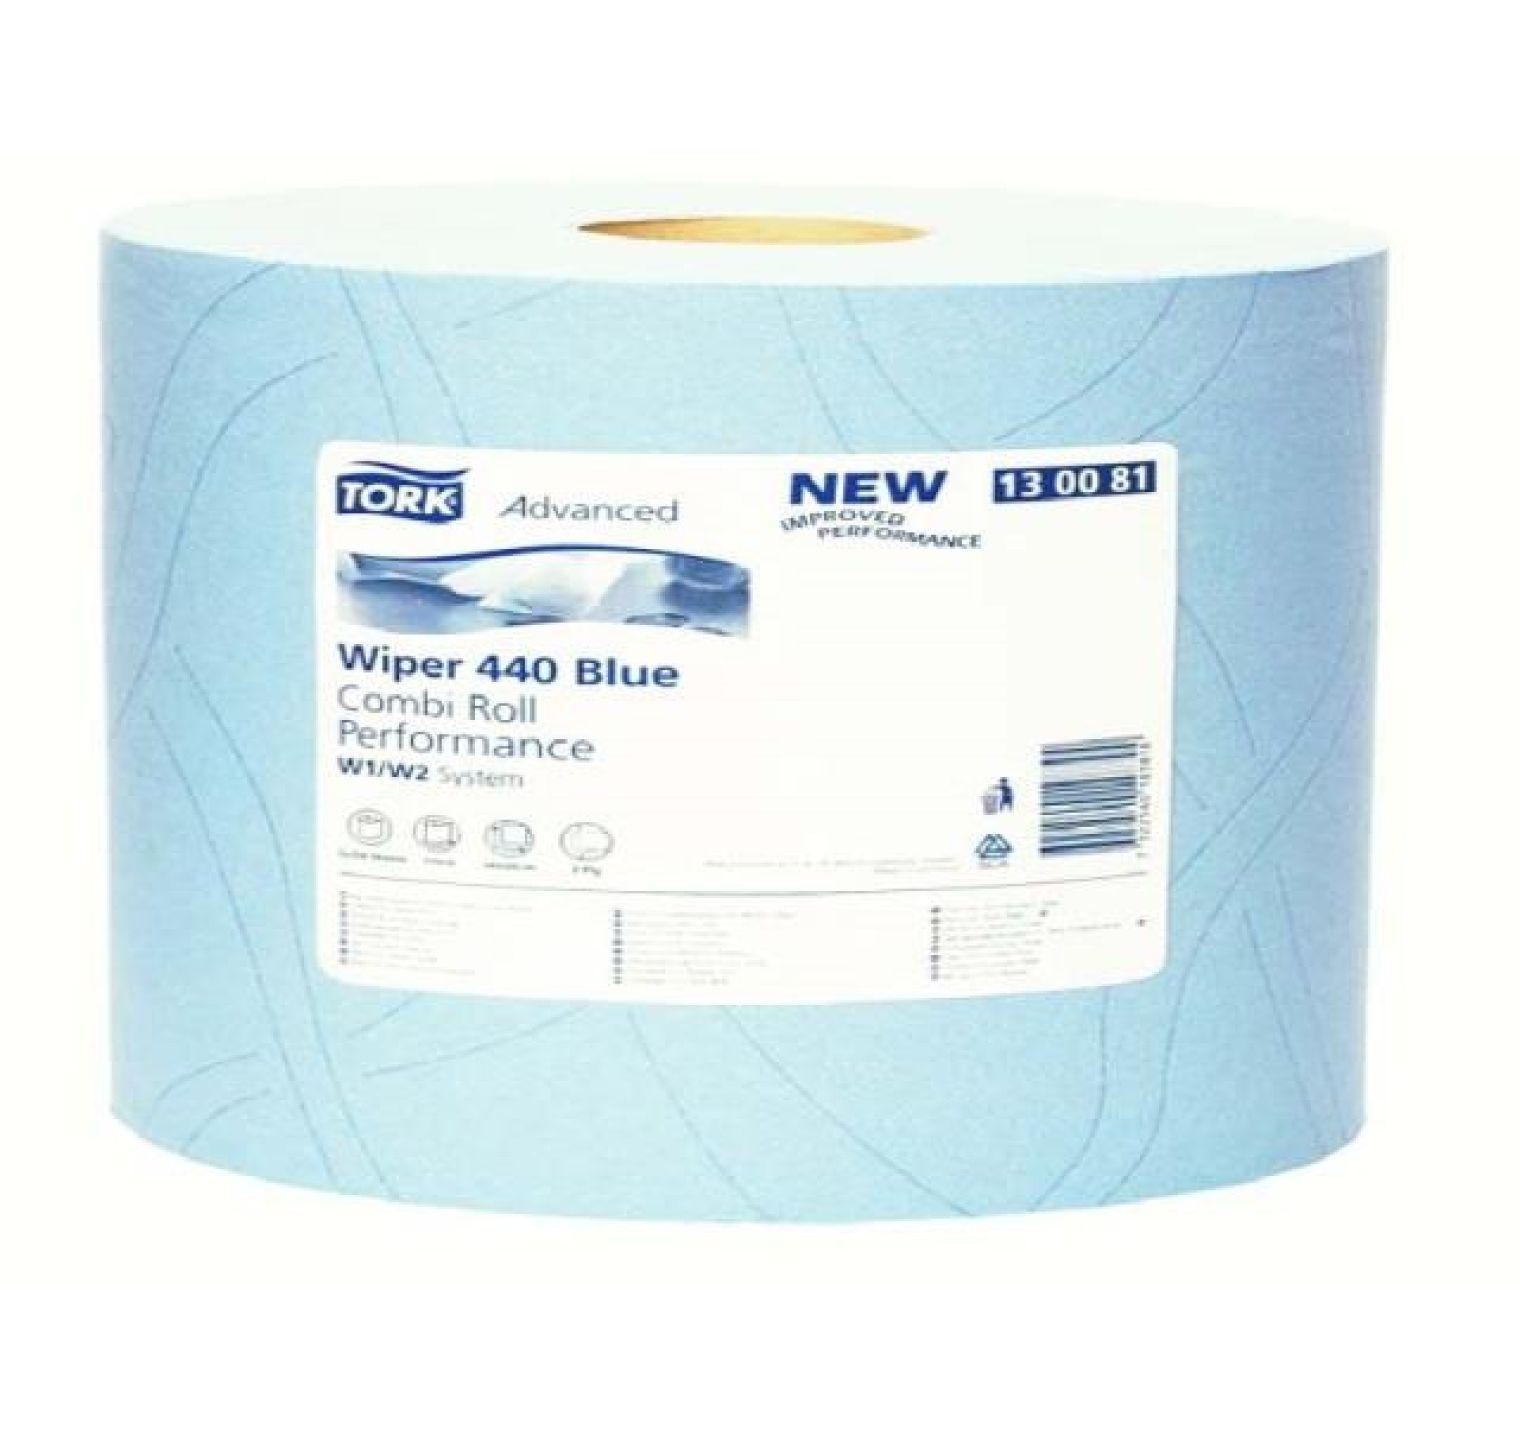 Tork Advanced Wiper 440 Blue Perfor